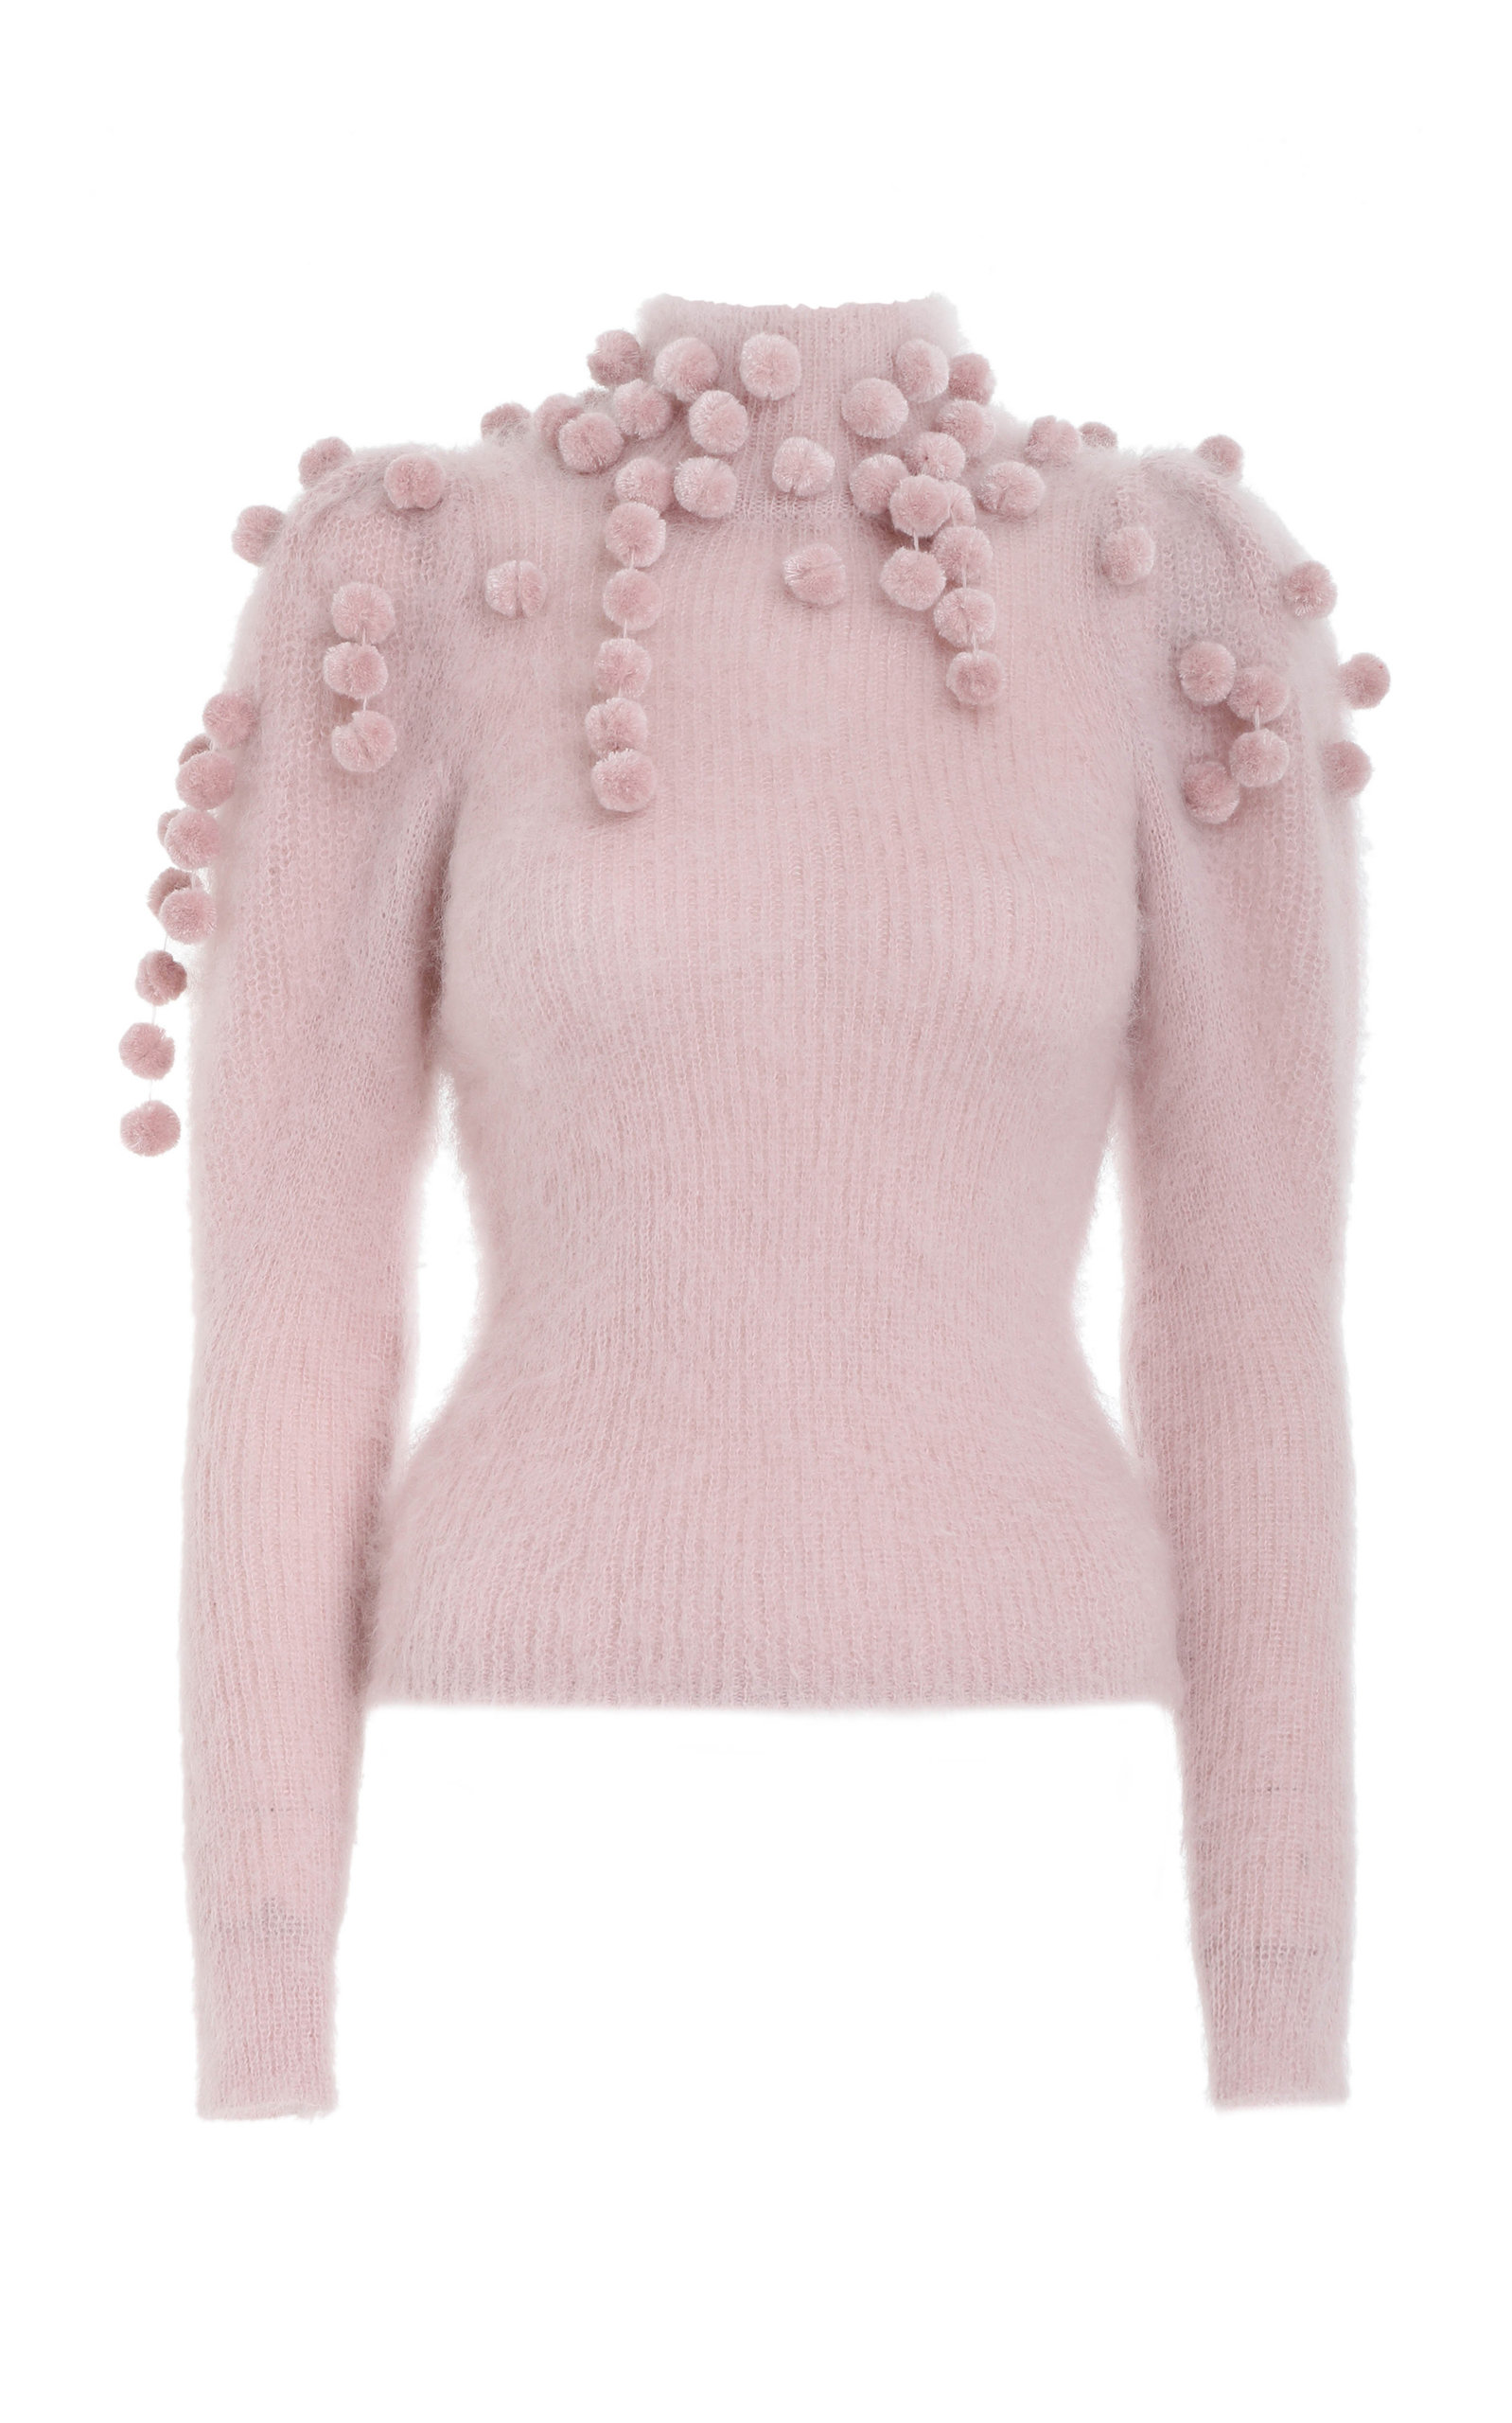 Zimmermann - Women's Embellished Mohair-Blend Sweater - Pink - Moda Operandi